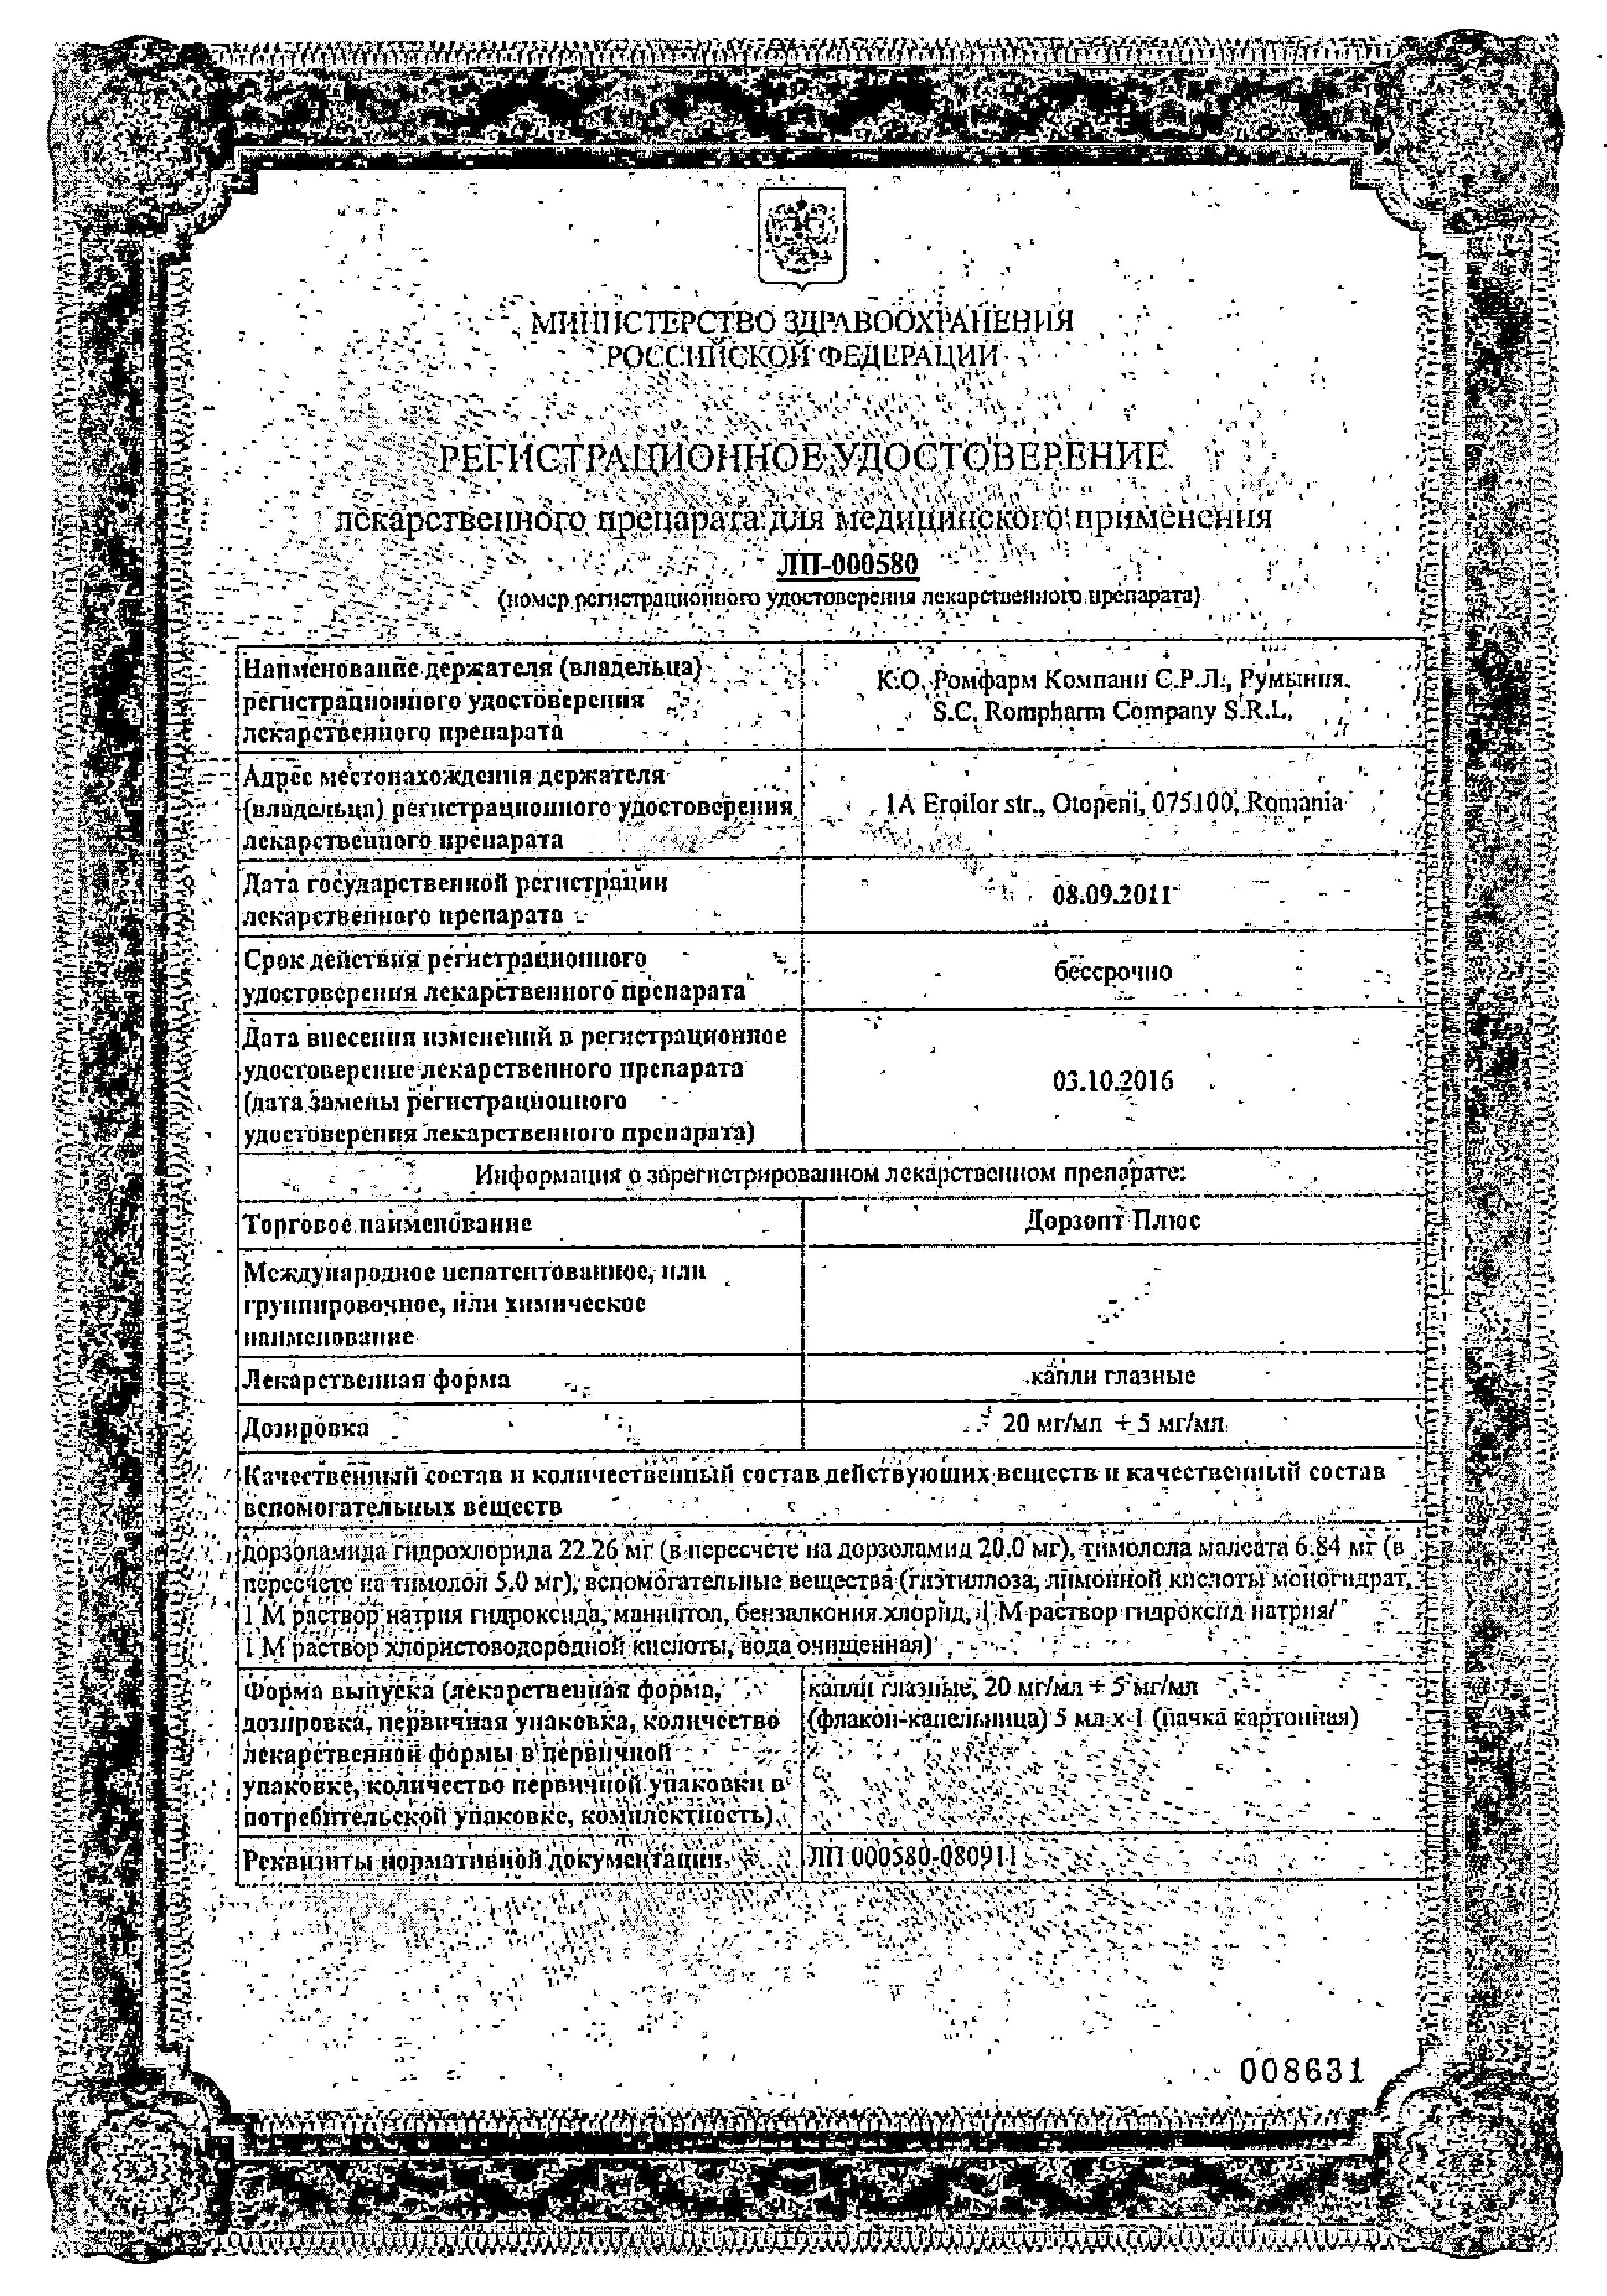 Дорзопт Плюс сертификат